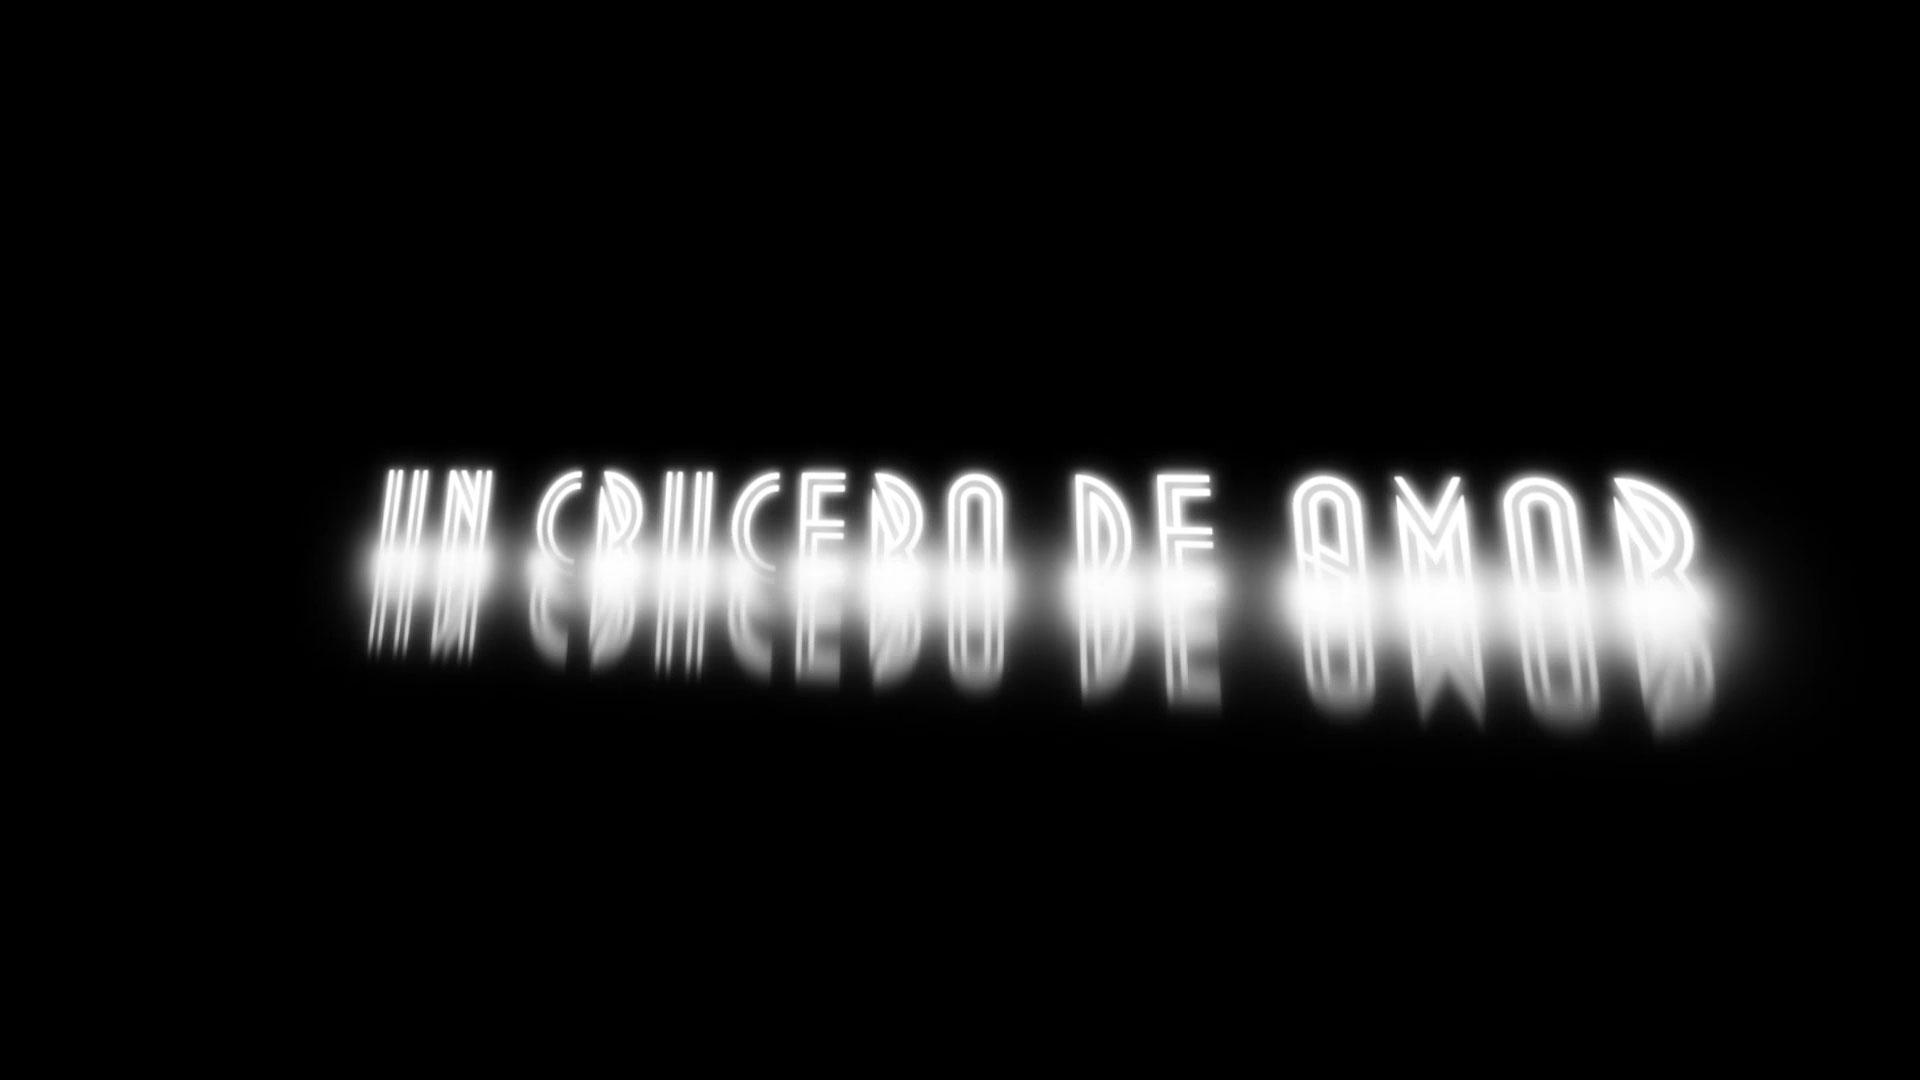 02_un_crucero_de_amor_mementoNET